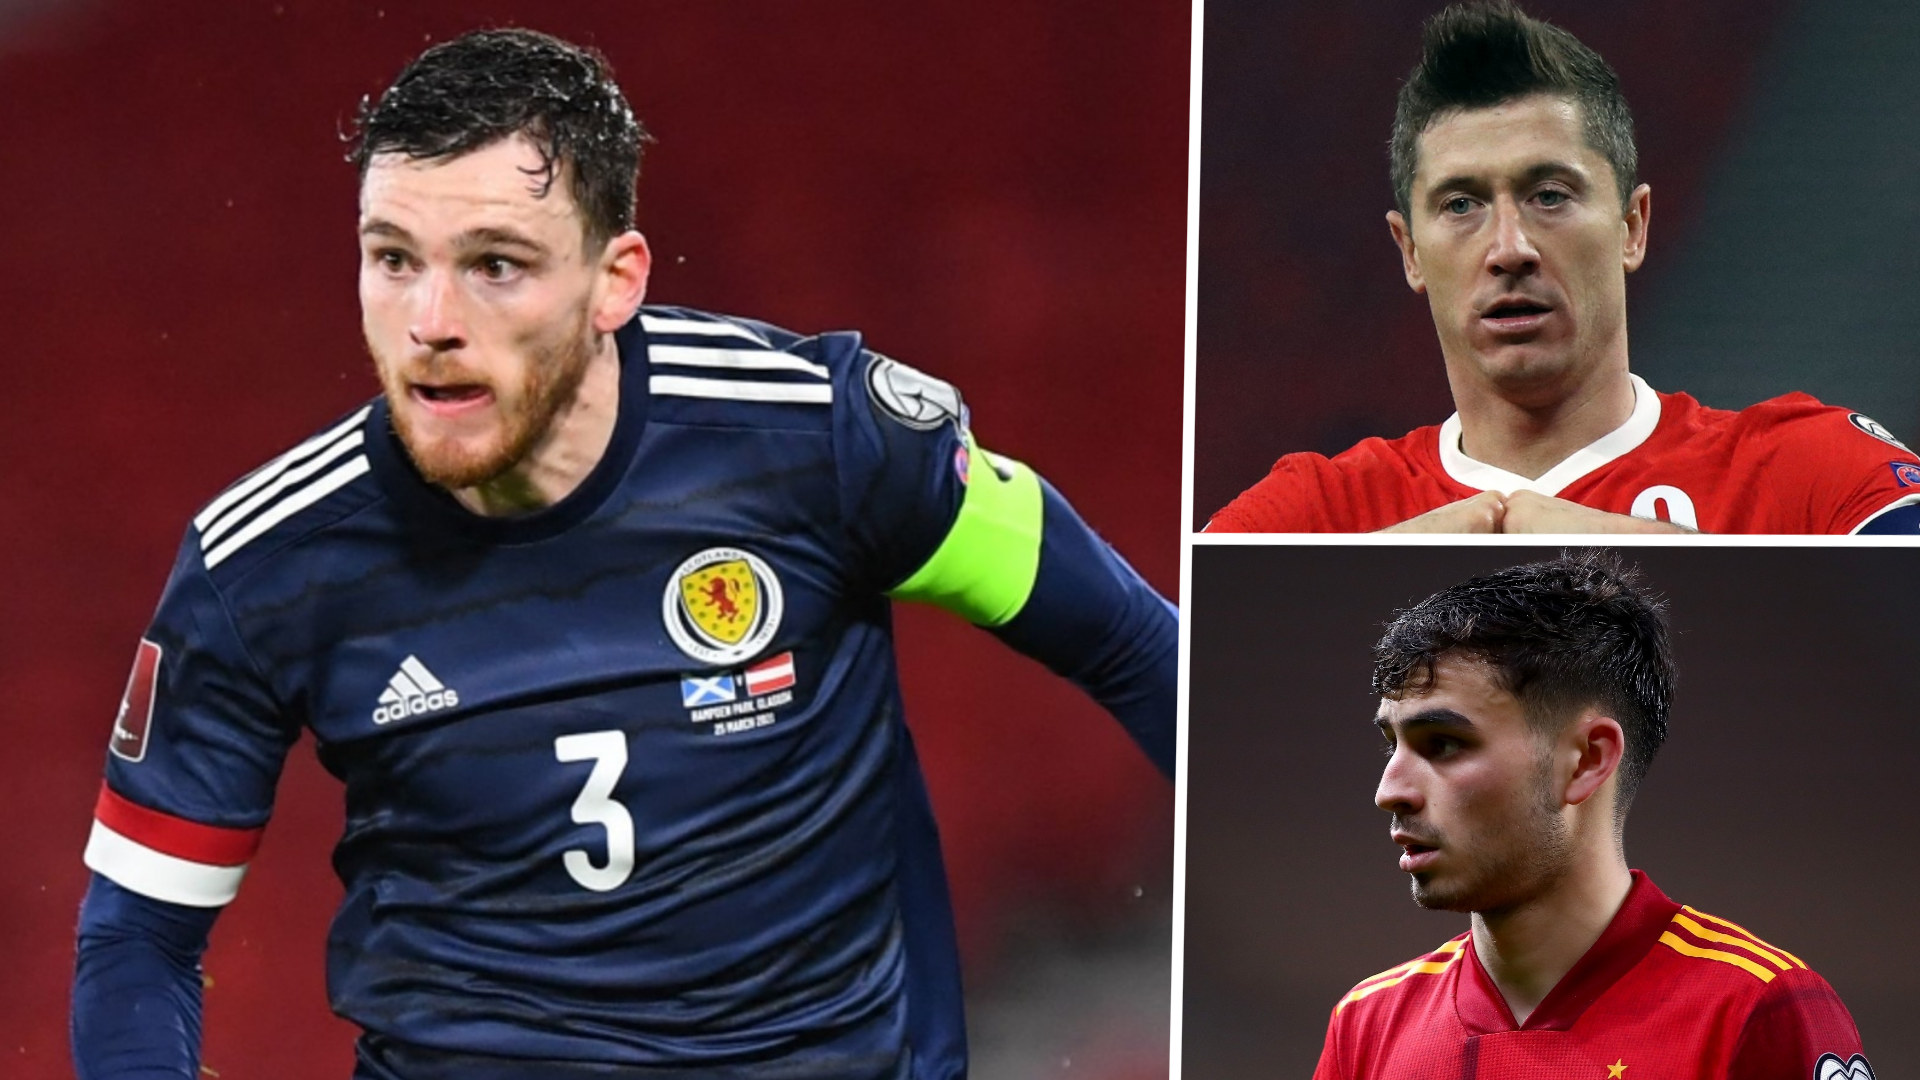 Euro 2020 matchday LIVE: Scotland vs Czech Republic, Poland vs Slovakia, Spain vs Sweden updates, news and TV reaction